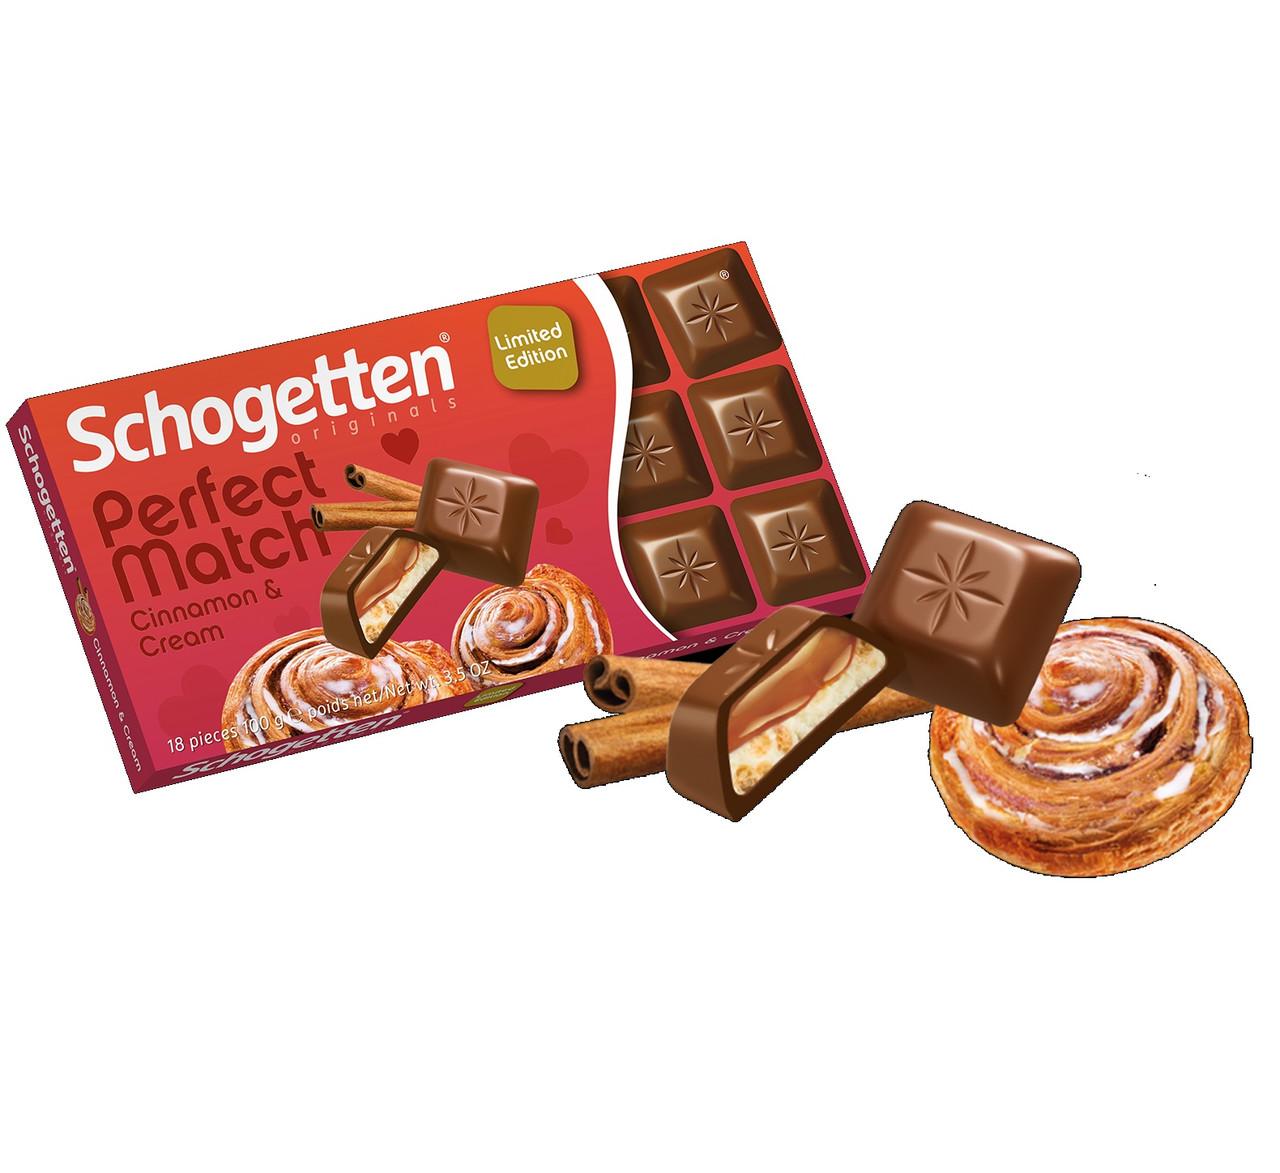 Шоколад молочный Schogetten Perfect Match (Шогеттен) Cinnamon Creme крем с корицей 100 г Германия